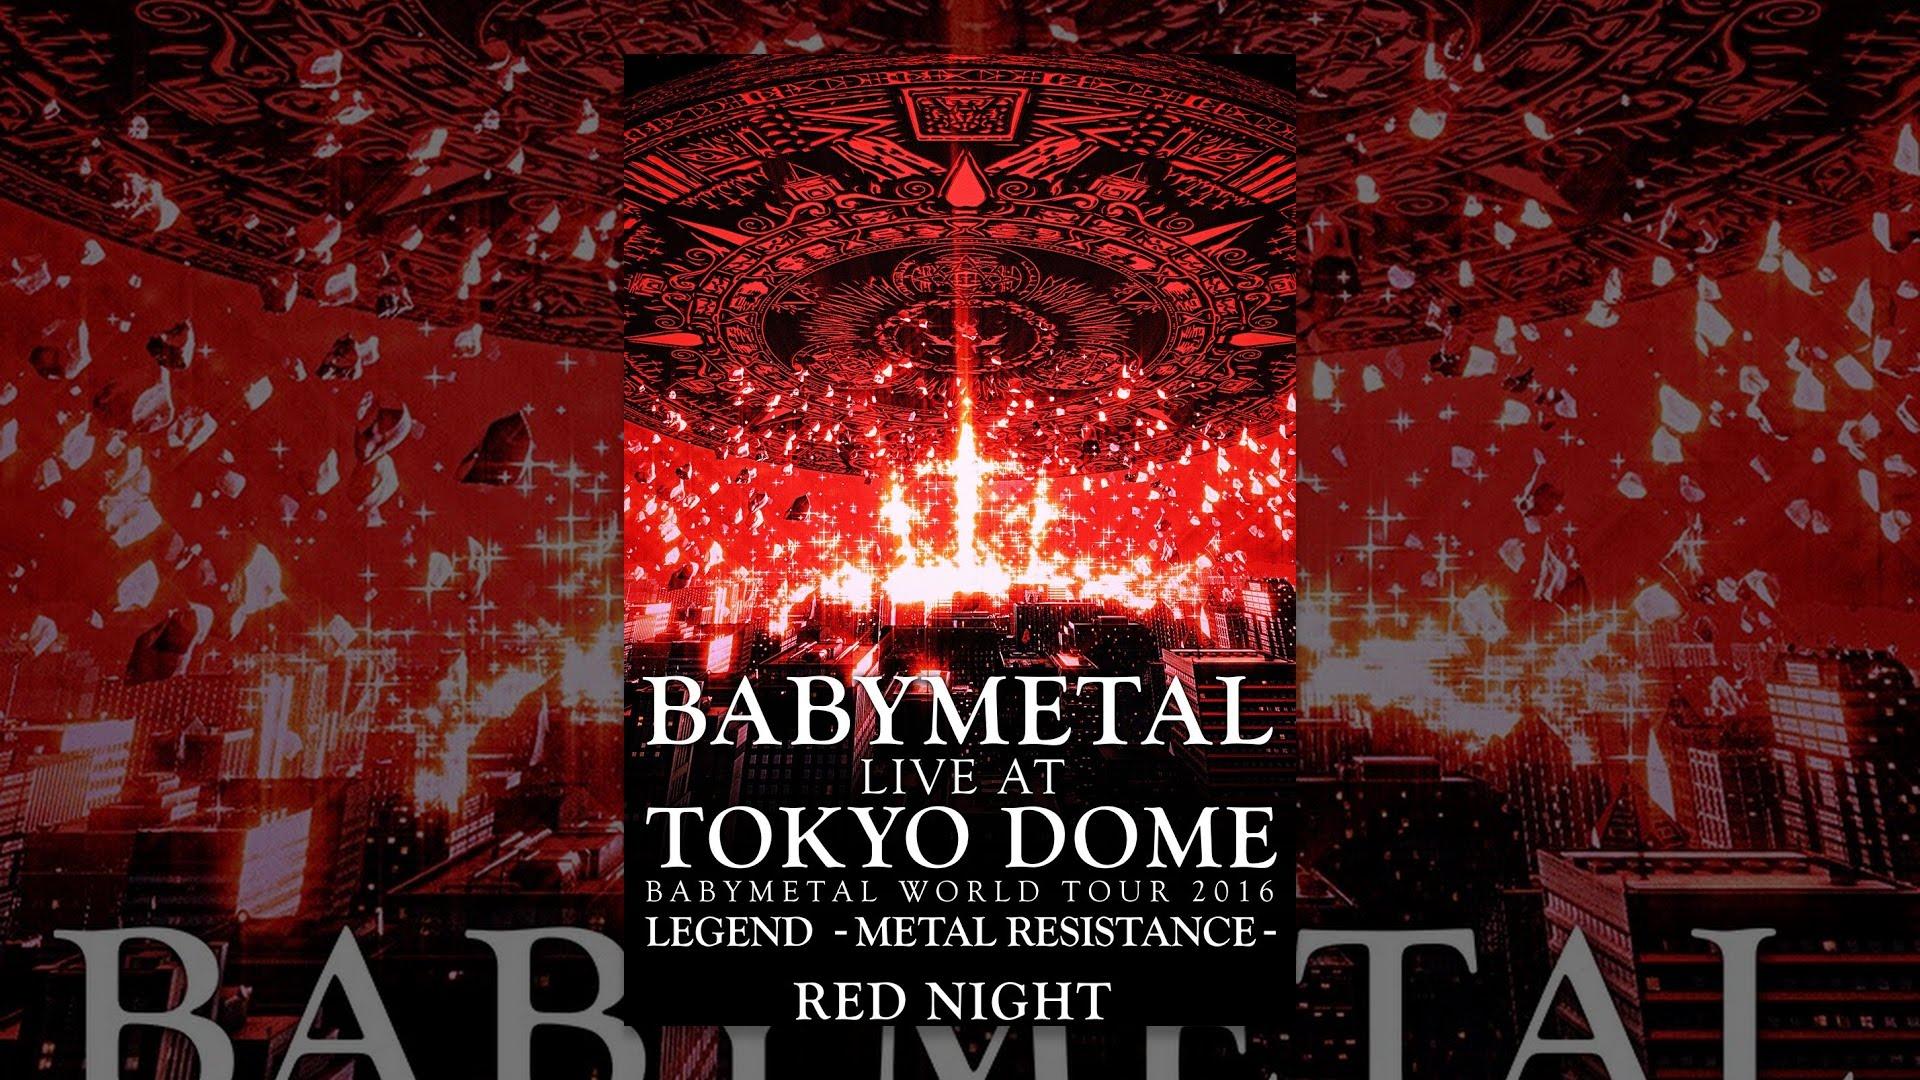 BABYMETAL: LIVE AT TOKYO DOME ~ BABYMETAL WORLD TOUR 2016